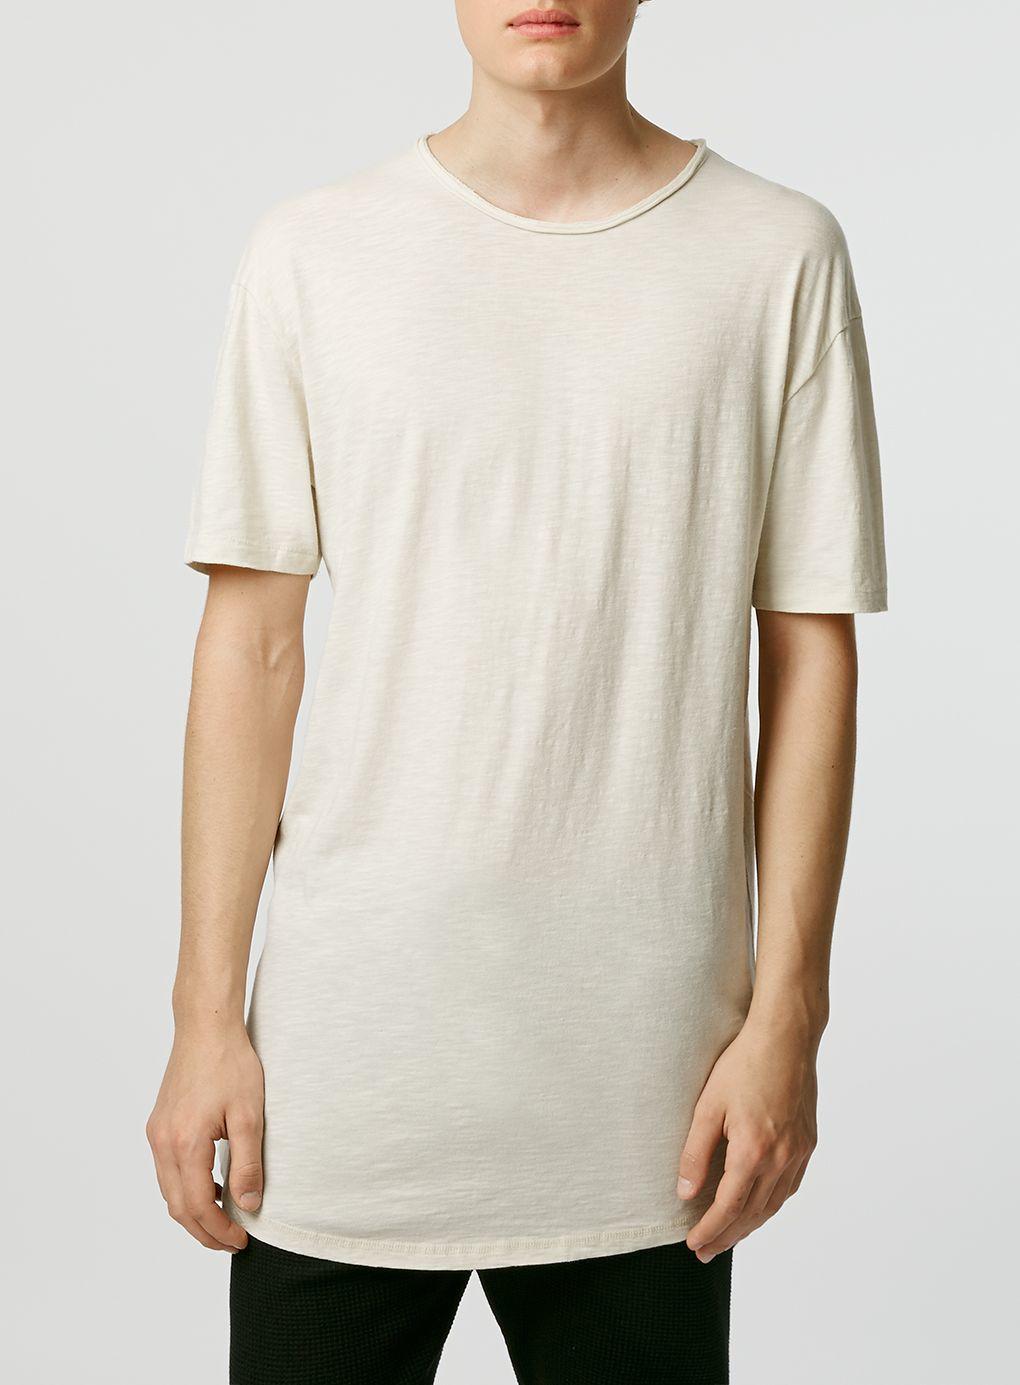 Topman short sleeve slubby long line t shirt in natural for Long line short sleeve t shirt